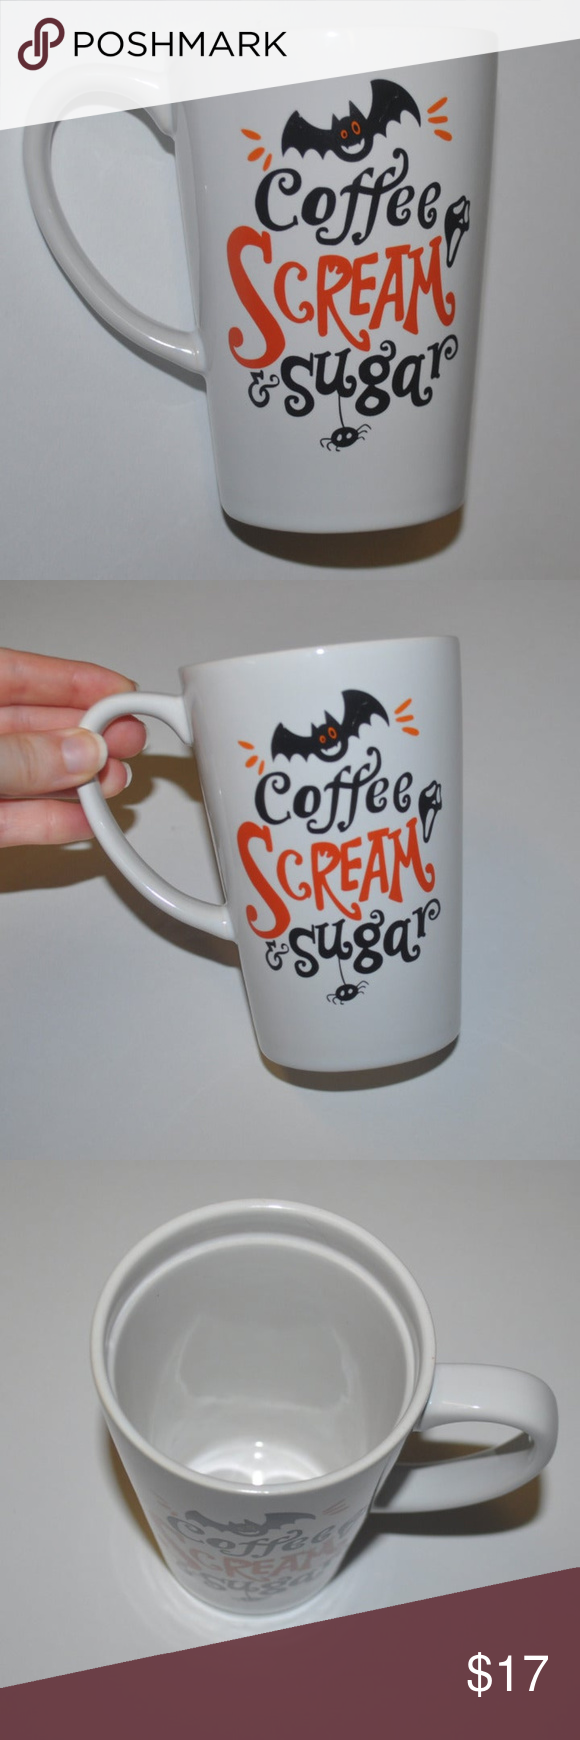 Coffee Scream & Sugar Mug Brand New without tag no flaws